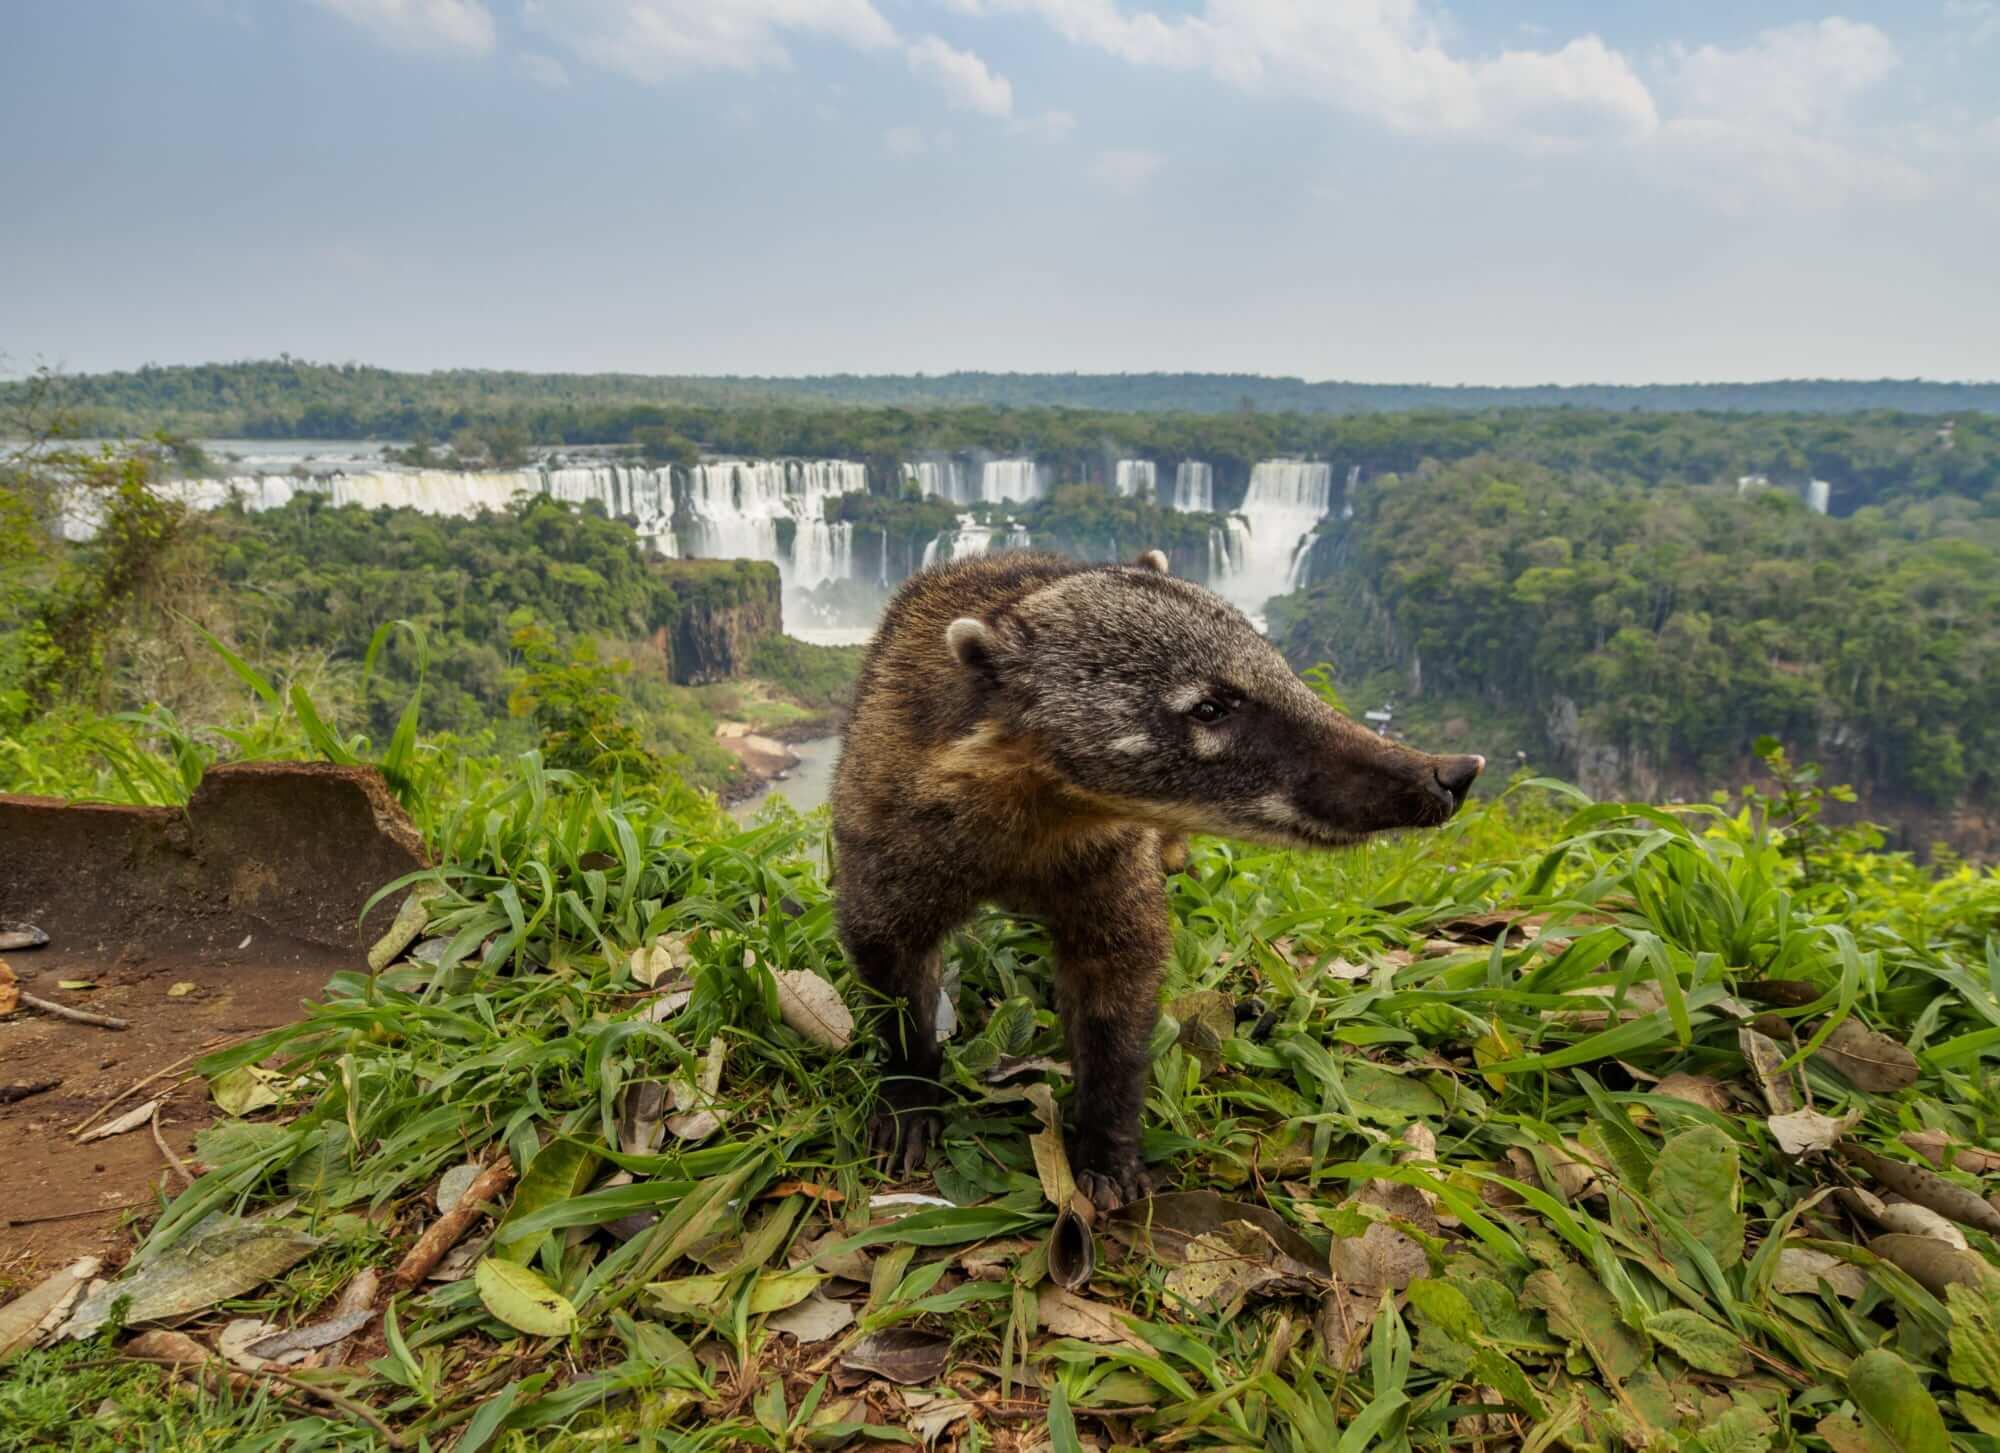 Capybara at the Iguazu Falls